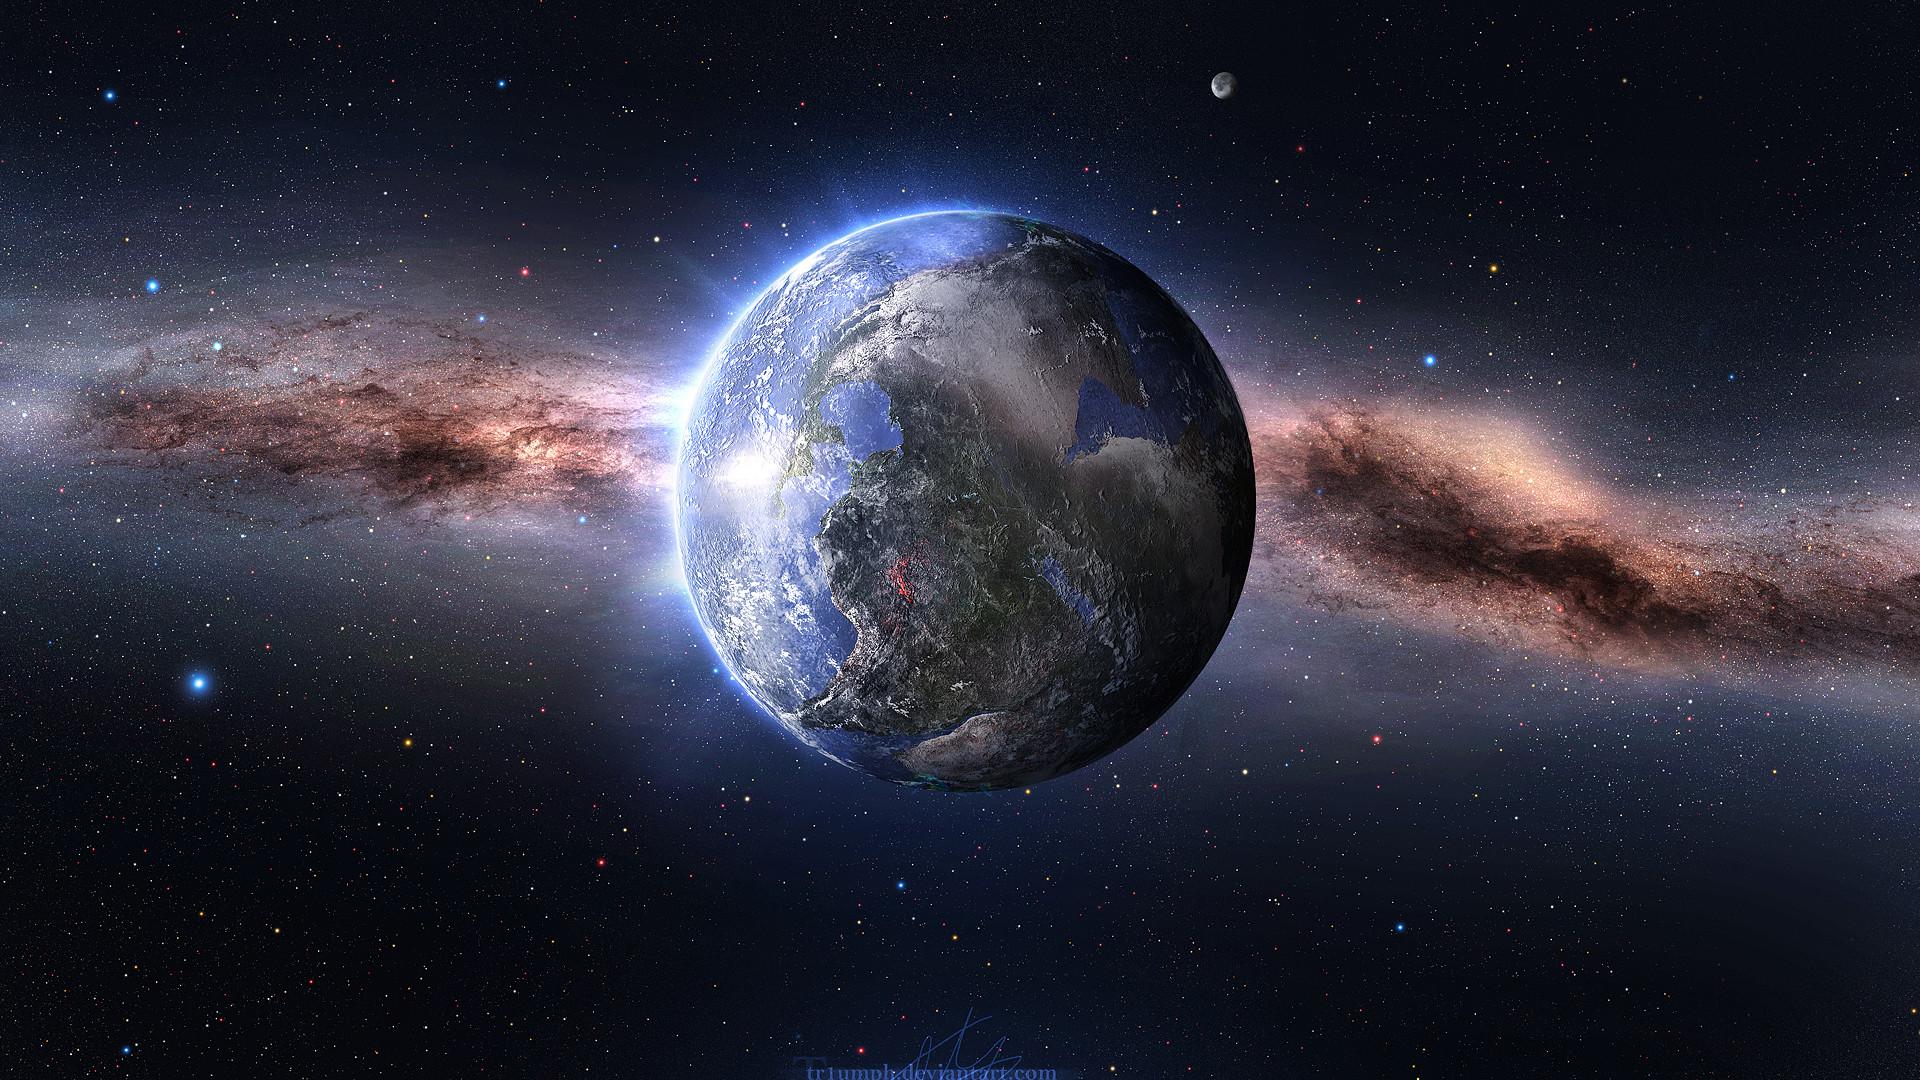 Space Desktop Wallpaper HD 76+ images